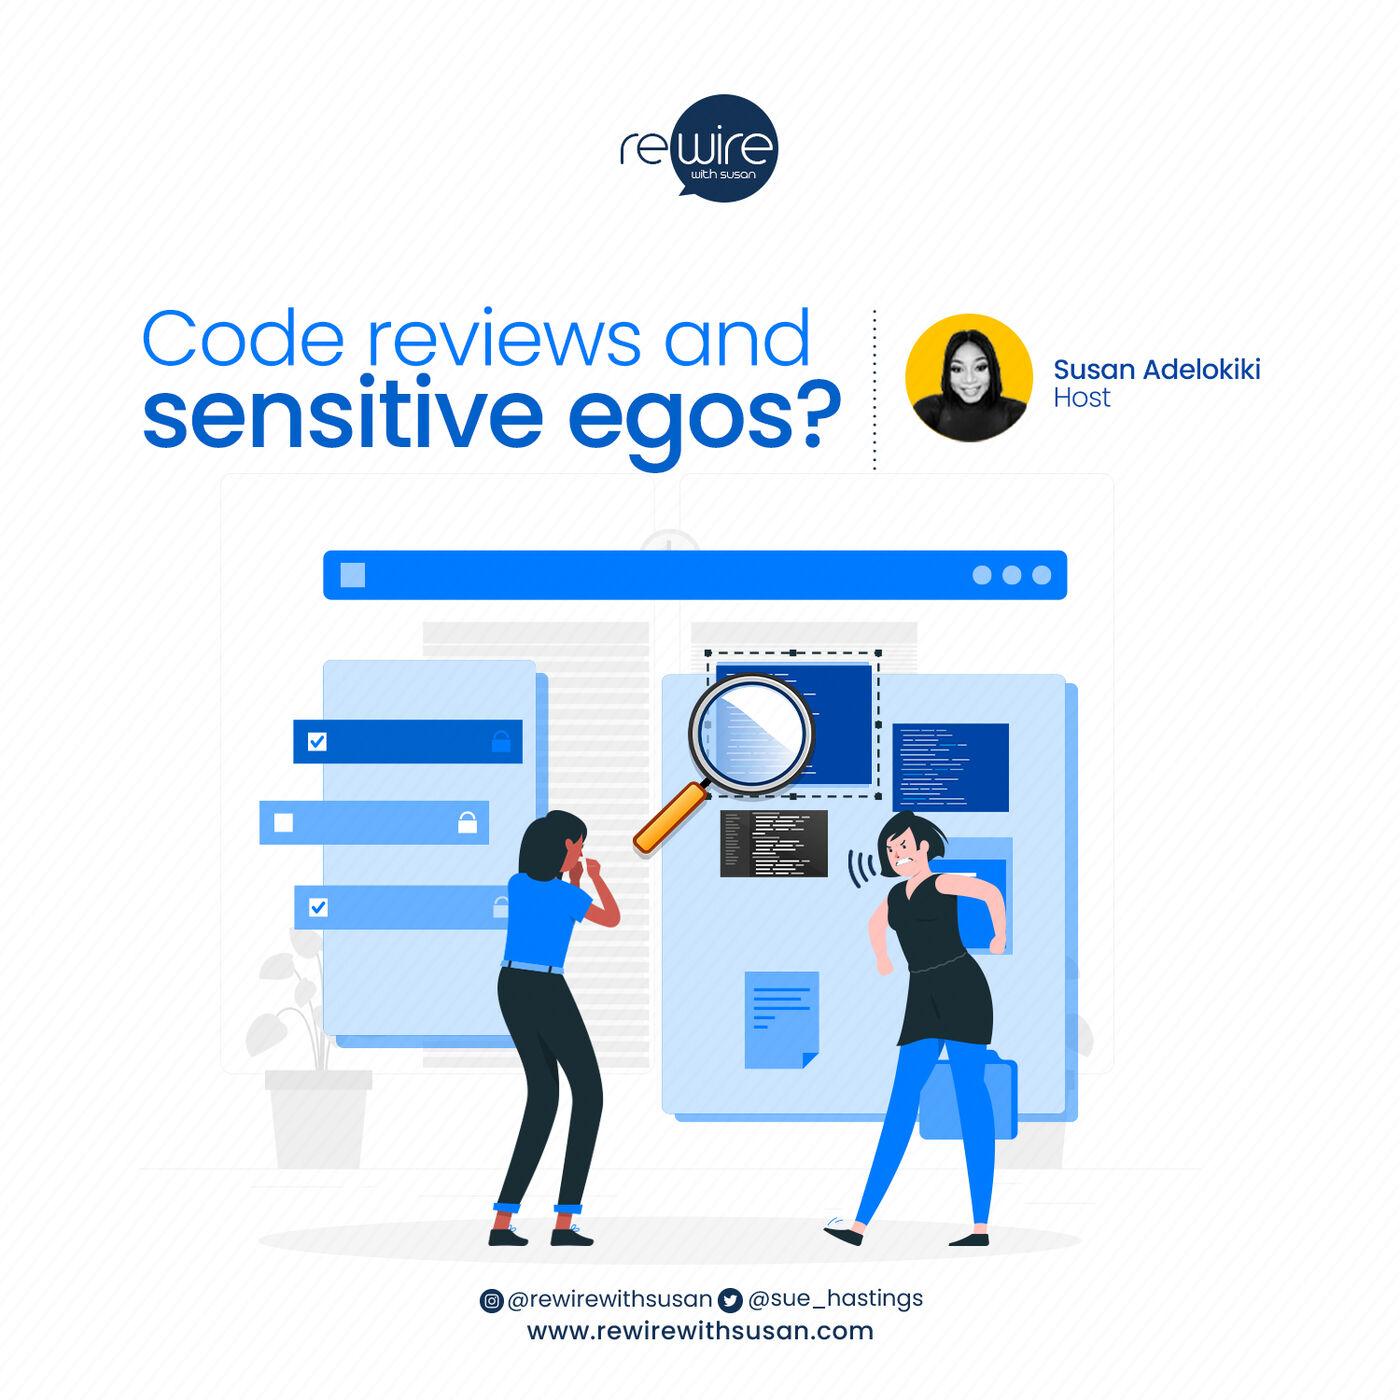 Code reviews and 'sensitive egos'?